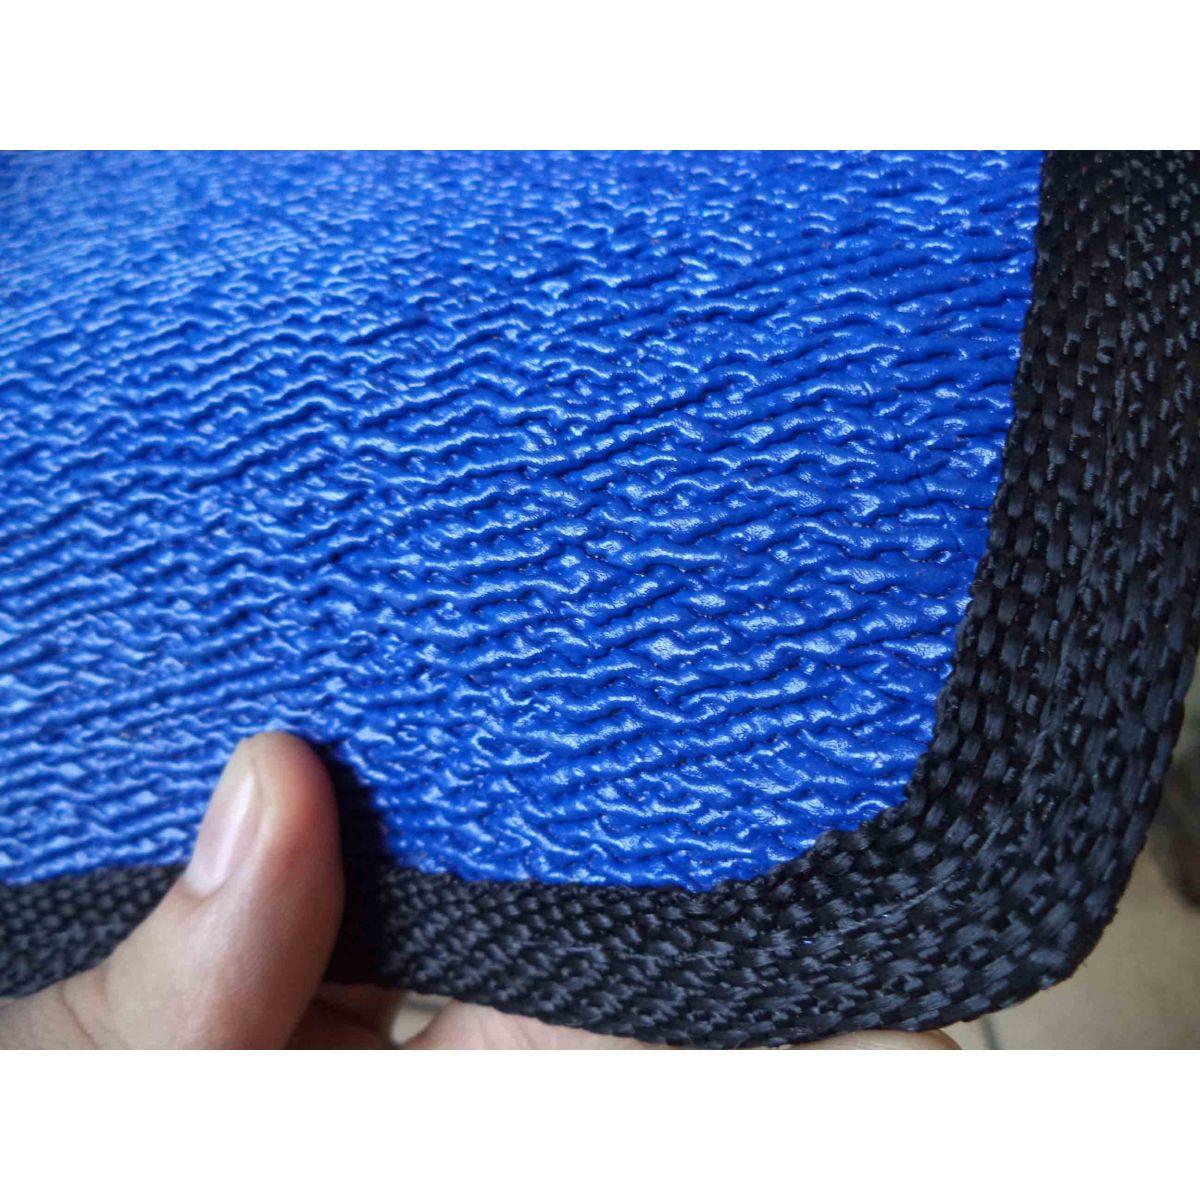 Jogo Tapete Automotivo Carro Blazer S10 Azul